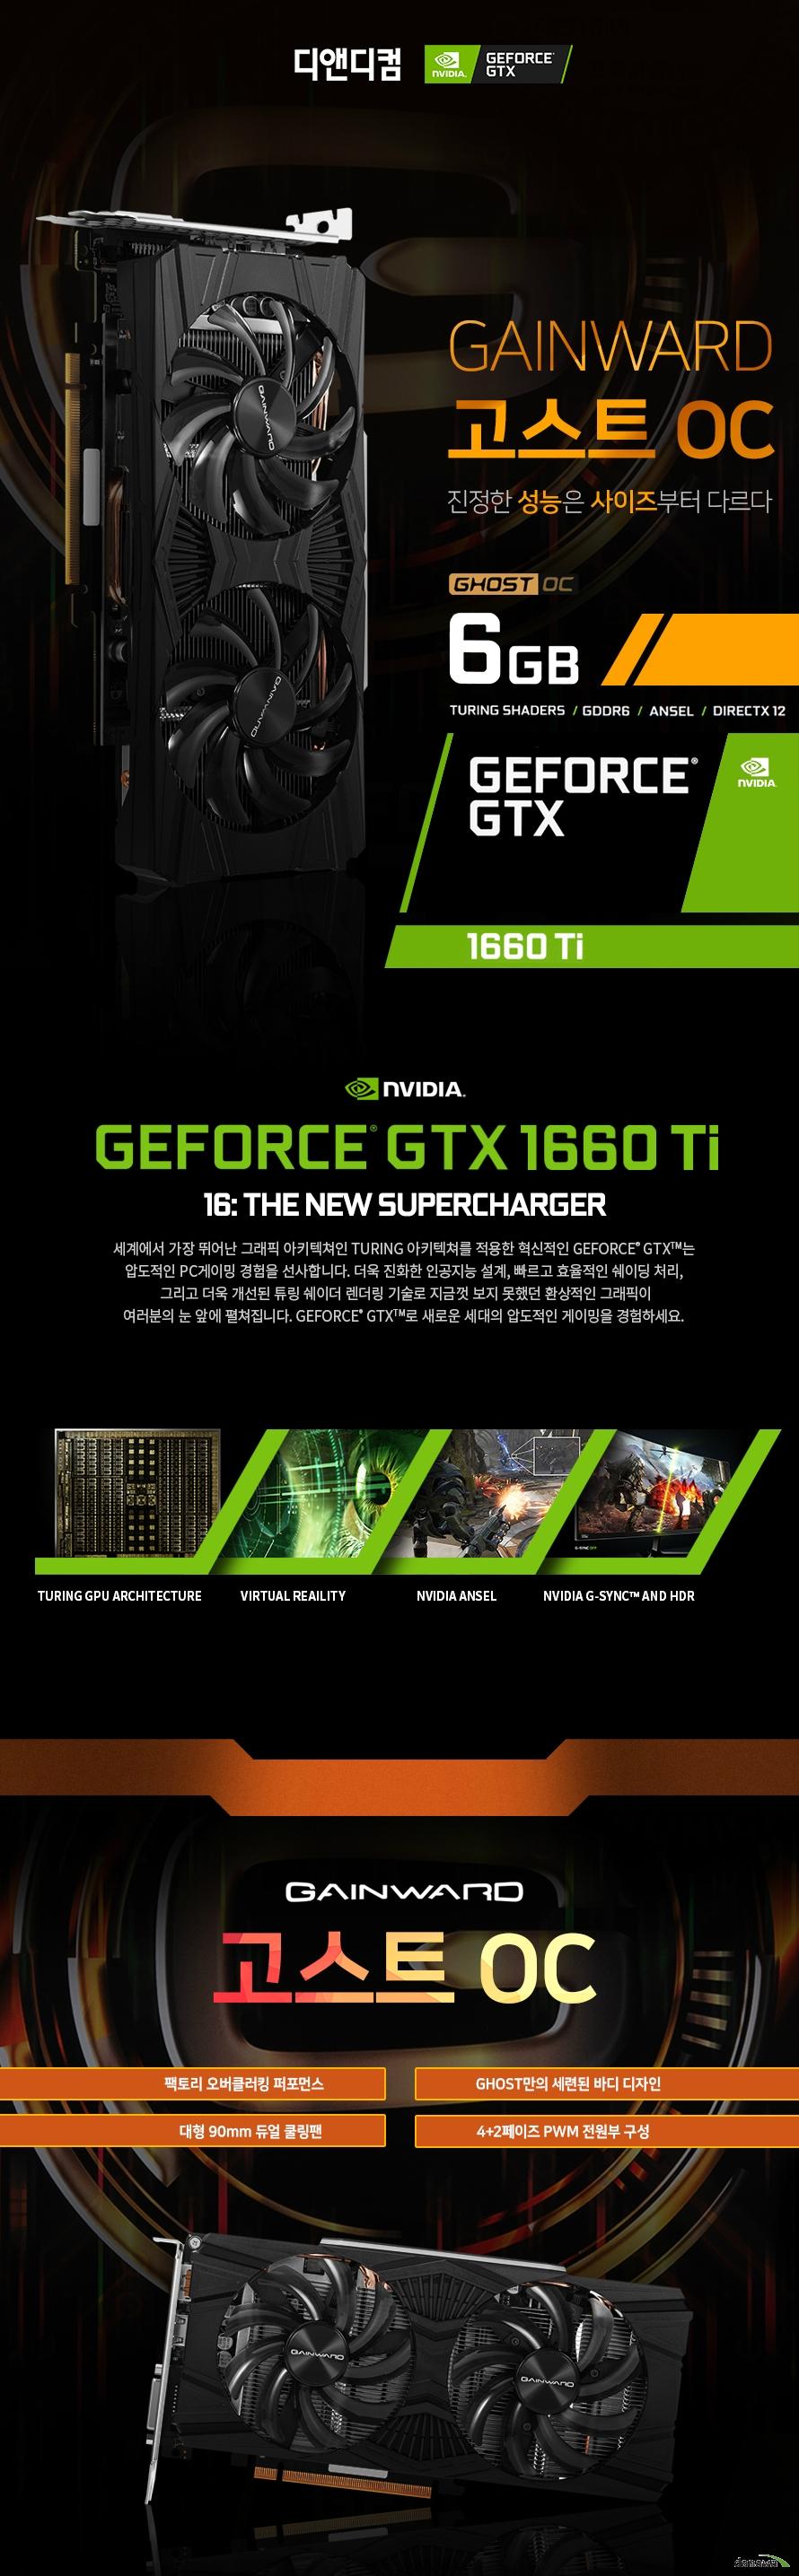 GAINWARD 지포스 gTX 1660 TI 고스트 OC D5 6GB 디앤디컴 제품 크기      길이 235밀리미터     높이 115밀리미터     두께 38밀리미터          제품 상세정보          GPU 엔진 사양          프로세서 코어 1536개     베이스 클럭 1500메가헤르츠     부스트 클럭 1815메가헤르츠          메모리 사양          메모리 속도 12000메가헤르츠     메모리 용량 6기가바이트     메모리 인터페이스 GDDR6 192비트          디스플레이 출력 정보          모니터 동시 지원 최대 3대     최대 해상도 7680 4320     출력 포트 DP1.4 포트 1개 HDMI 2.0포트 1개 듀얼링크 DVI D 1개     제품 전력 사양          그래픽카드 소모 전력 120와트     최소 시스템 요구 전력 450와트     전원 커넥터 8핀           제품 추가 사양          제품 인증번호 R R DND GW g1660ti GT     품질 보증기간 3년 무상 보증       디앤디컴 3년무상 서비스          디앤디컴에서 유통하는 게인워드 지포스 gtx 제품은 3년 무상 품질 보증 서비스를 제공합니다.     디앤디컴 서비스 센터 02 702 1358